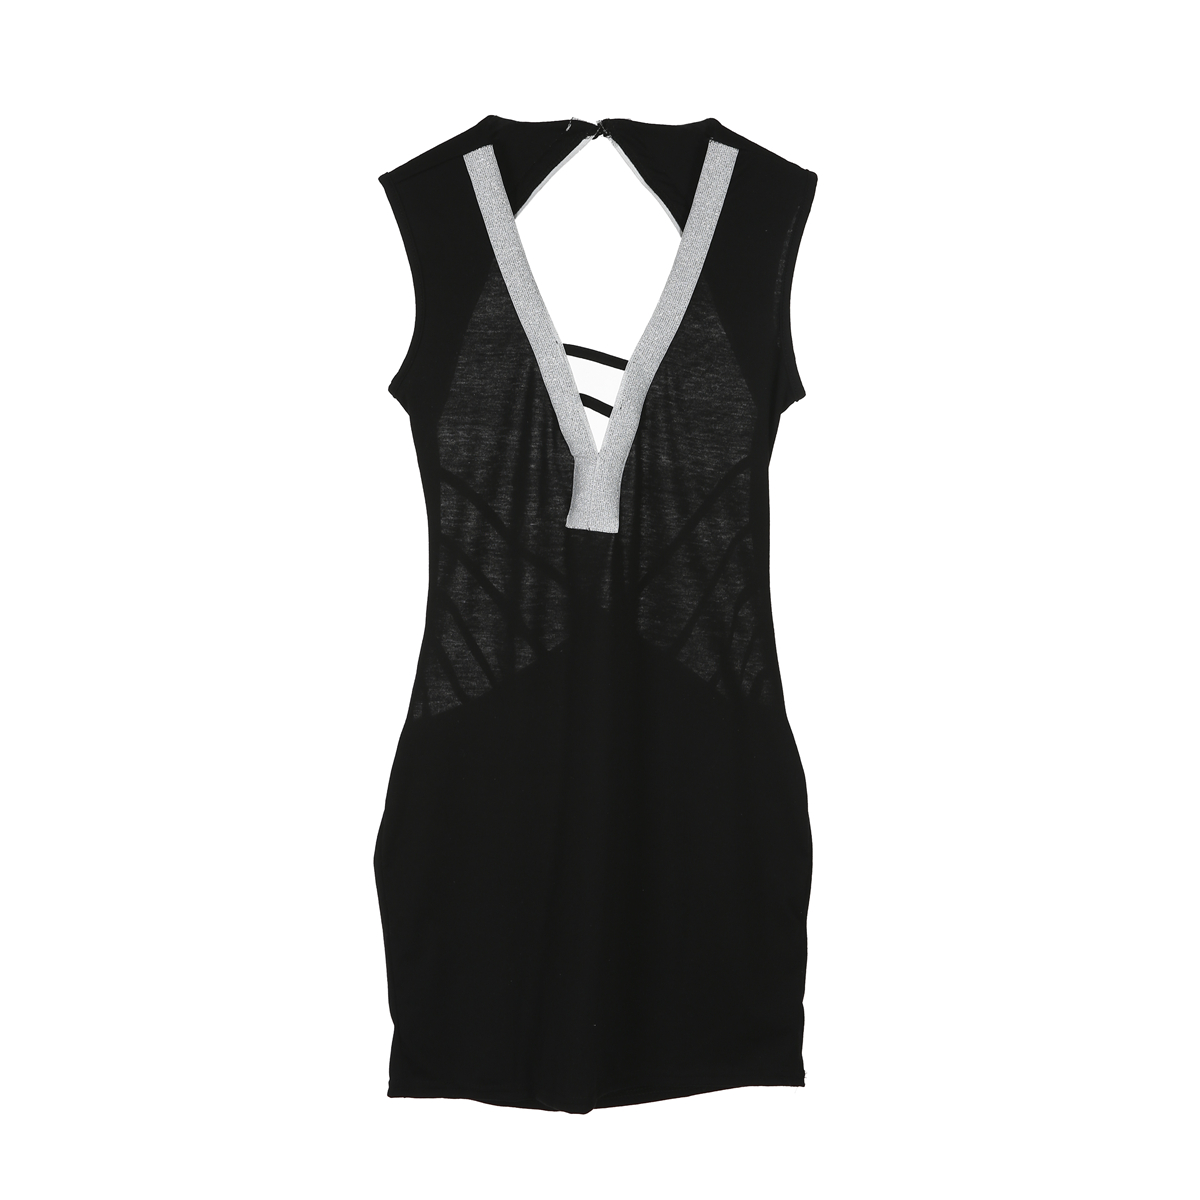 2019 SEXY Women Bandage Bodycon Backless Evening Party V Neck Club Short Mini Dress